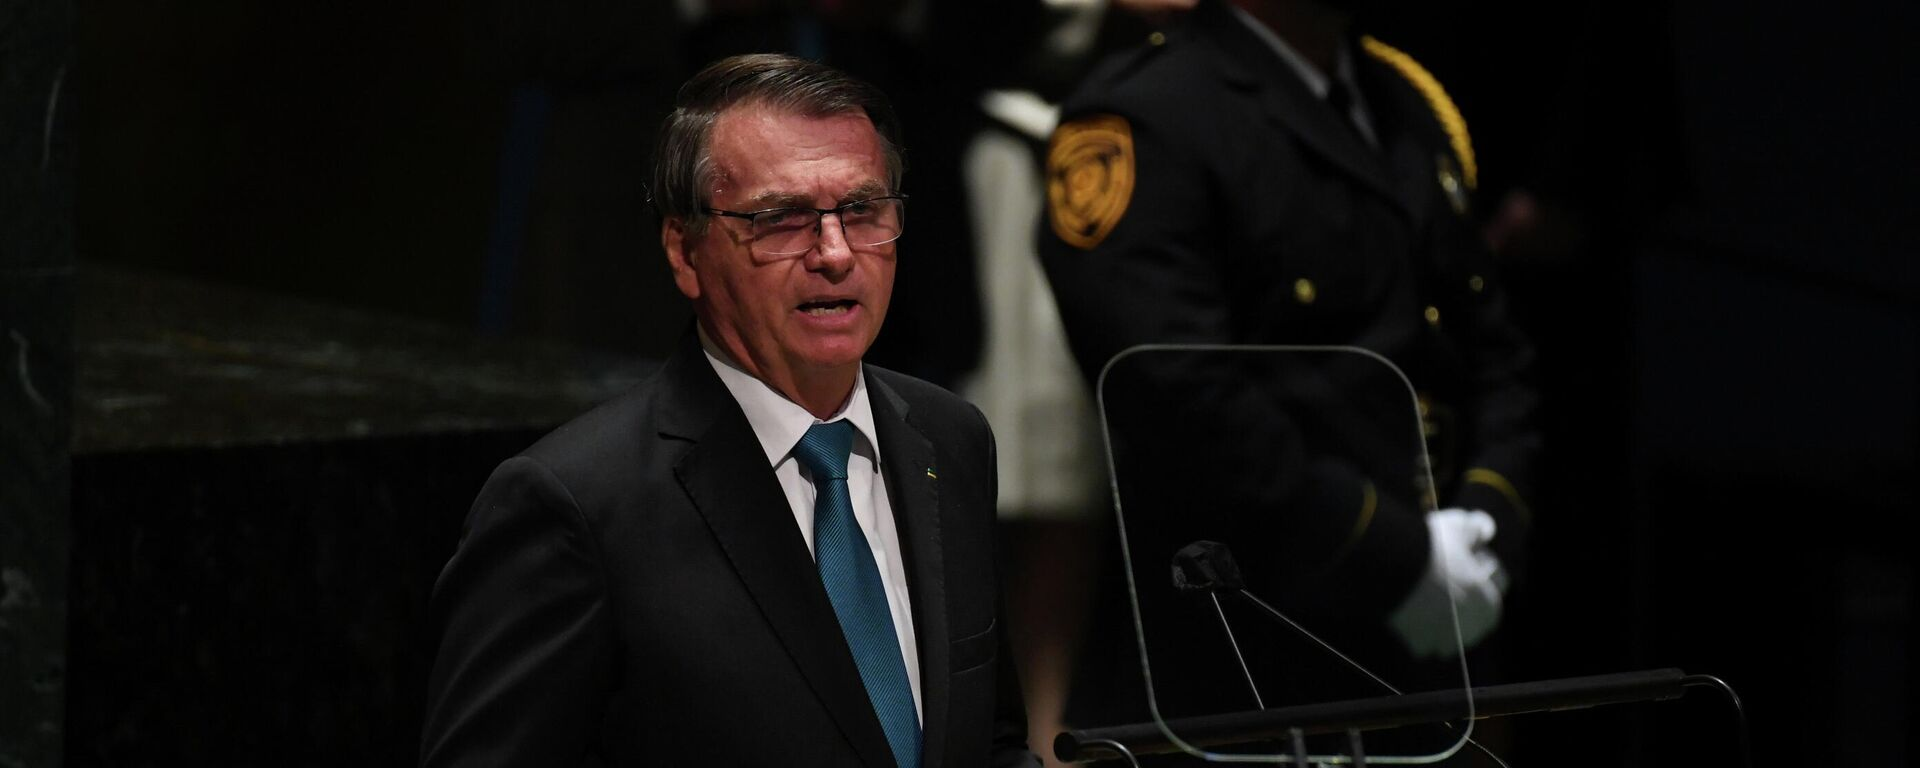 El presidente brasileño, Jair Bolsonaro - Sputnik Mundo, 1920, 21.09.2021